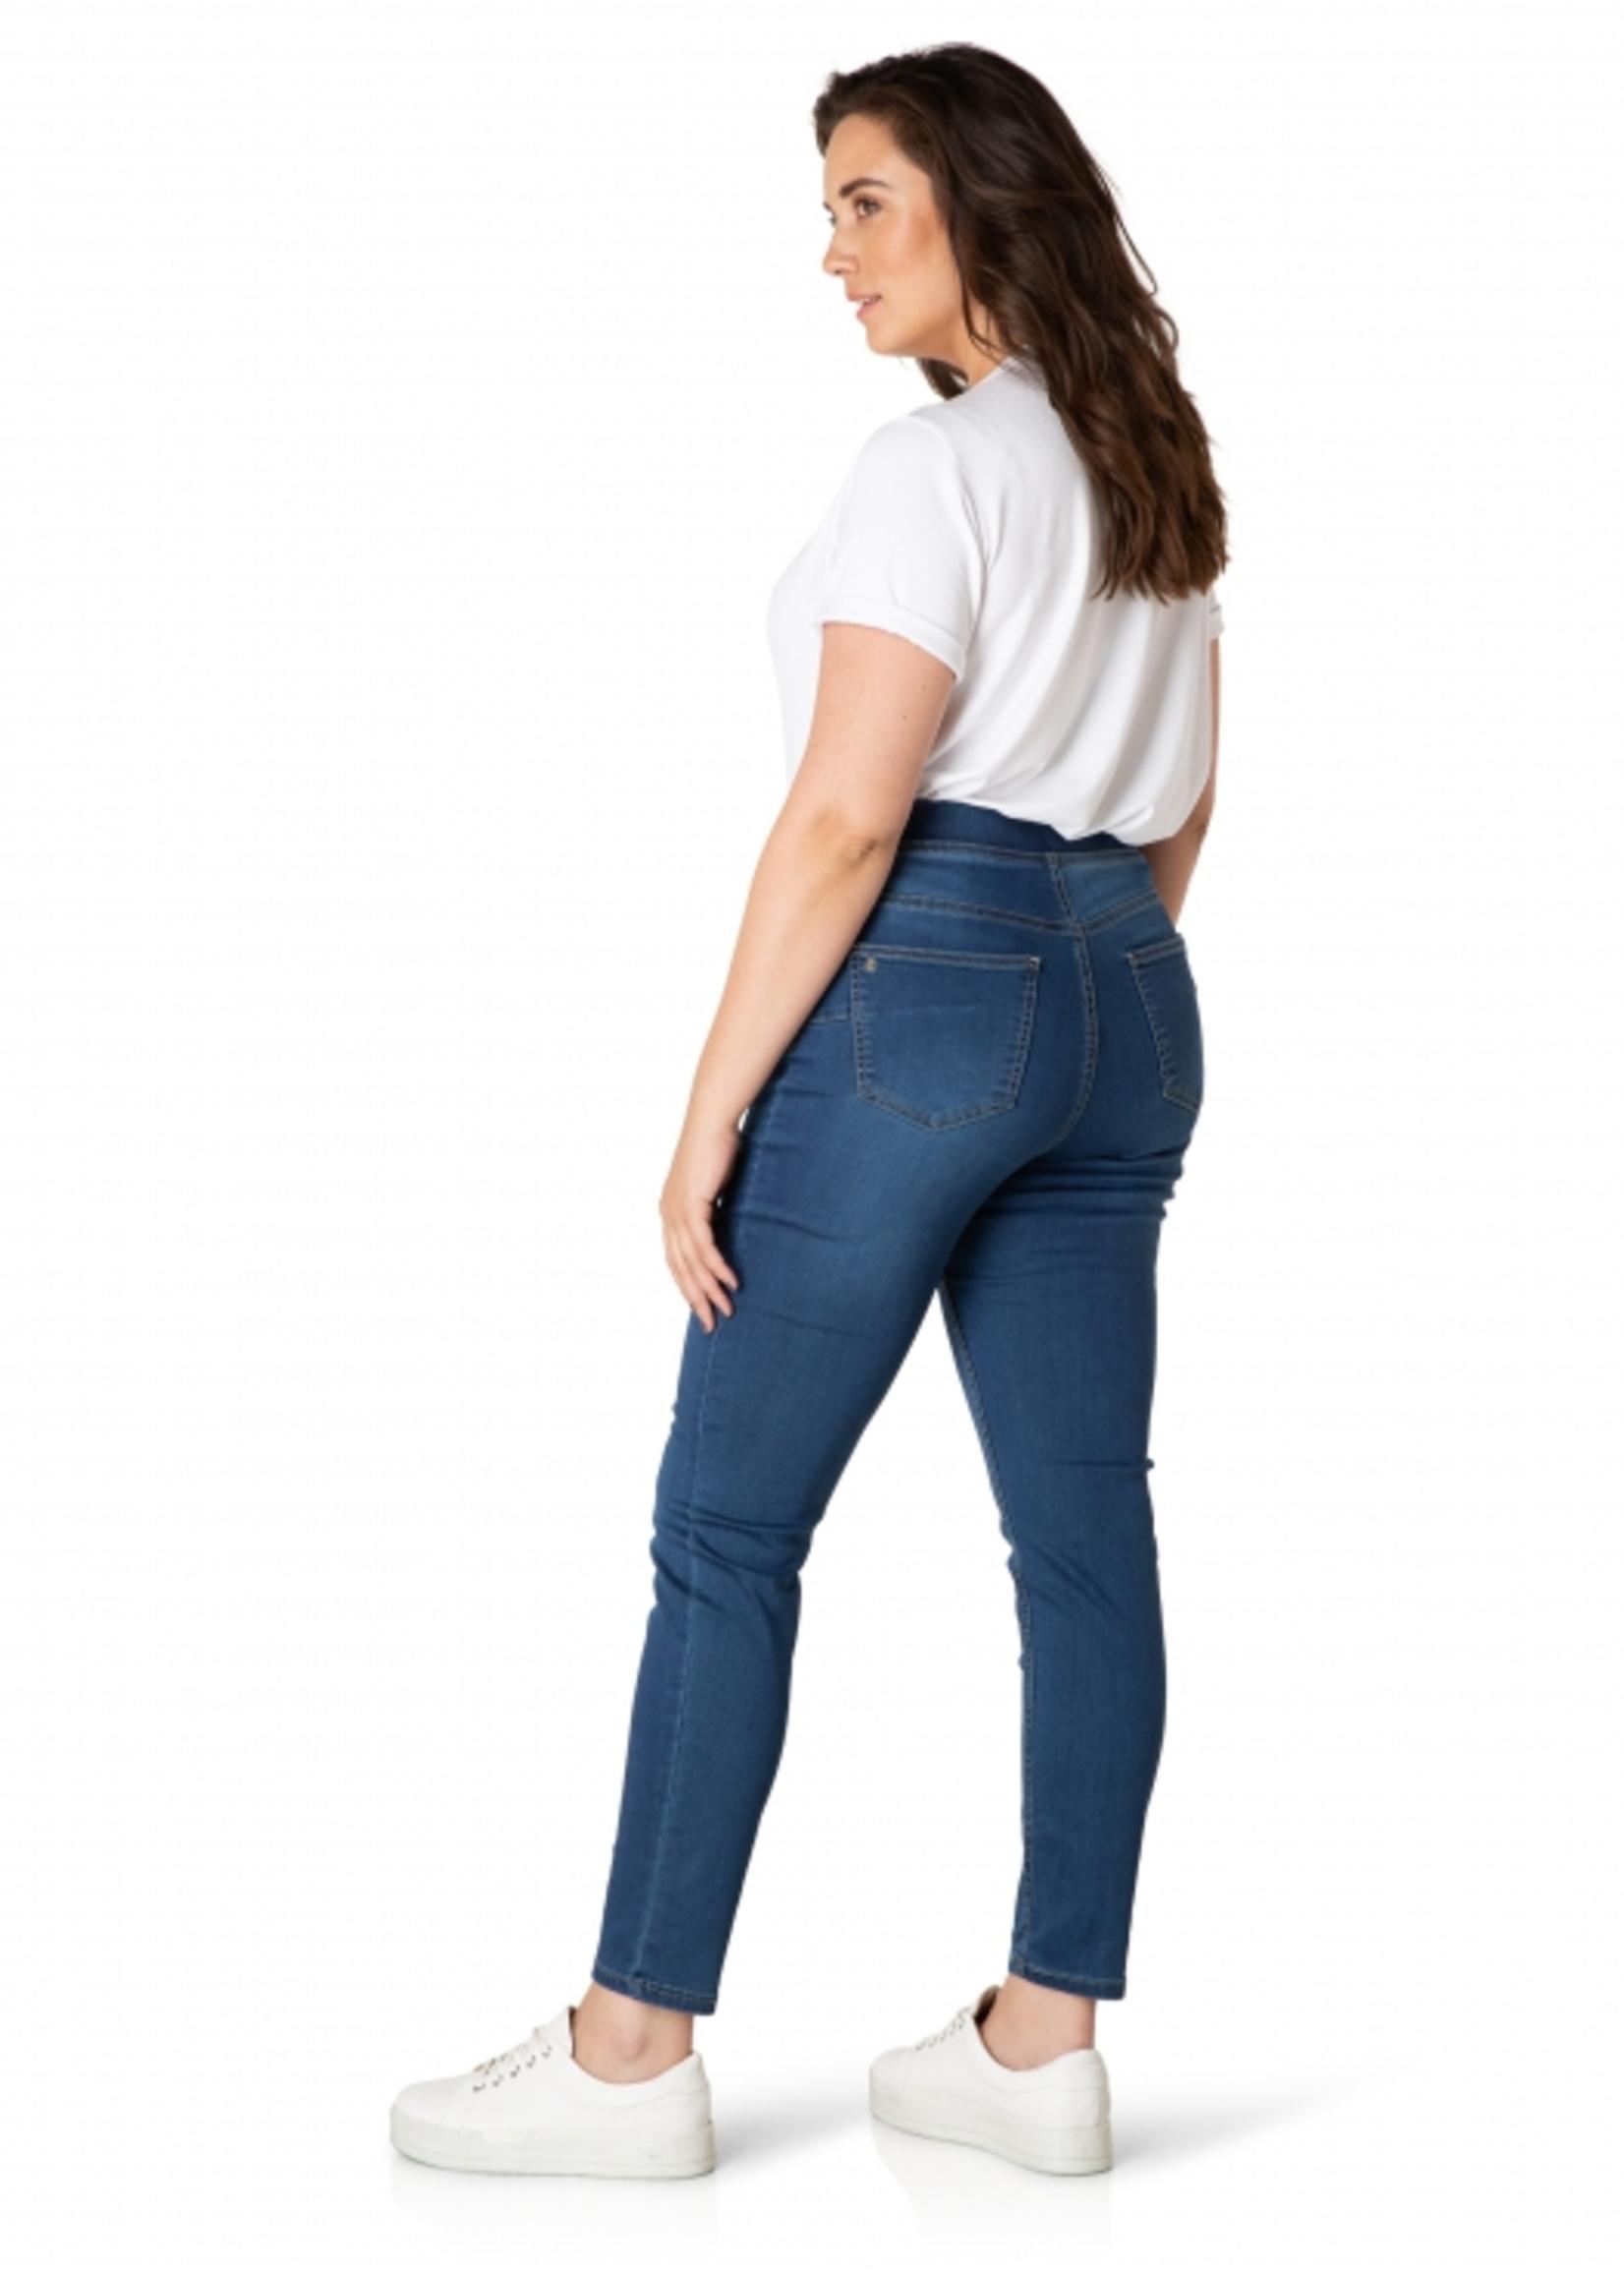 Yesta Yesta Tessa Jeans